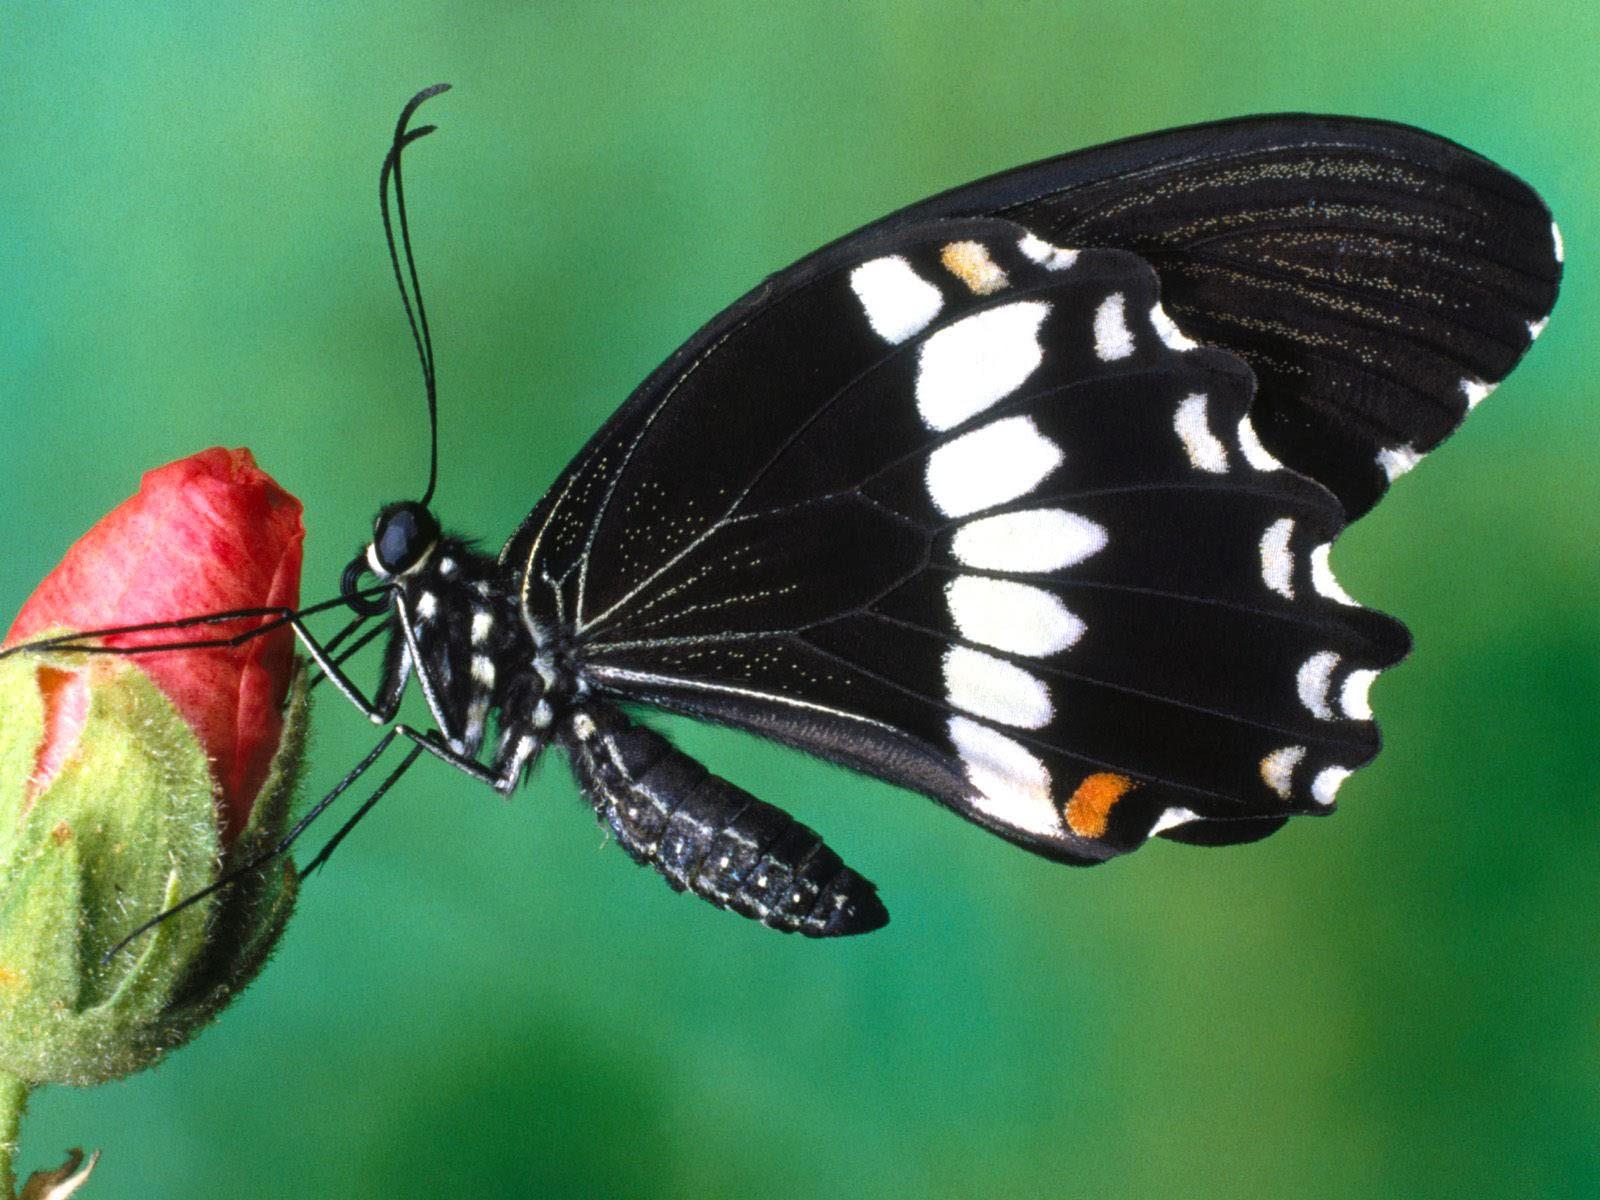 Keywords: Butterfly Wallpapers, Butterfly DesktopWallpapers, Butterfly